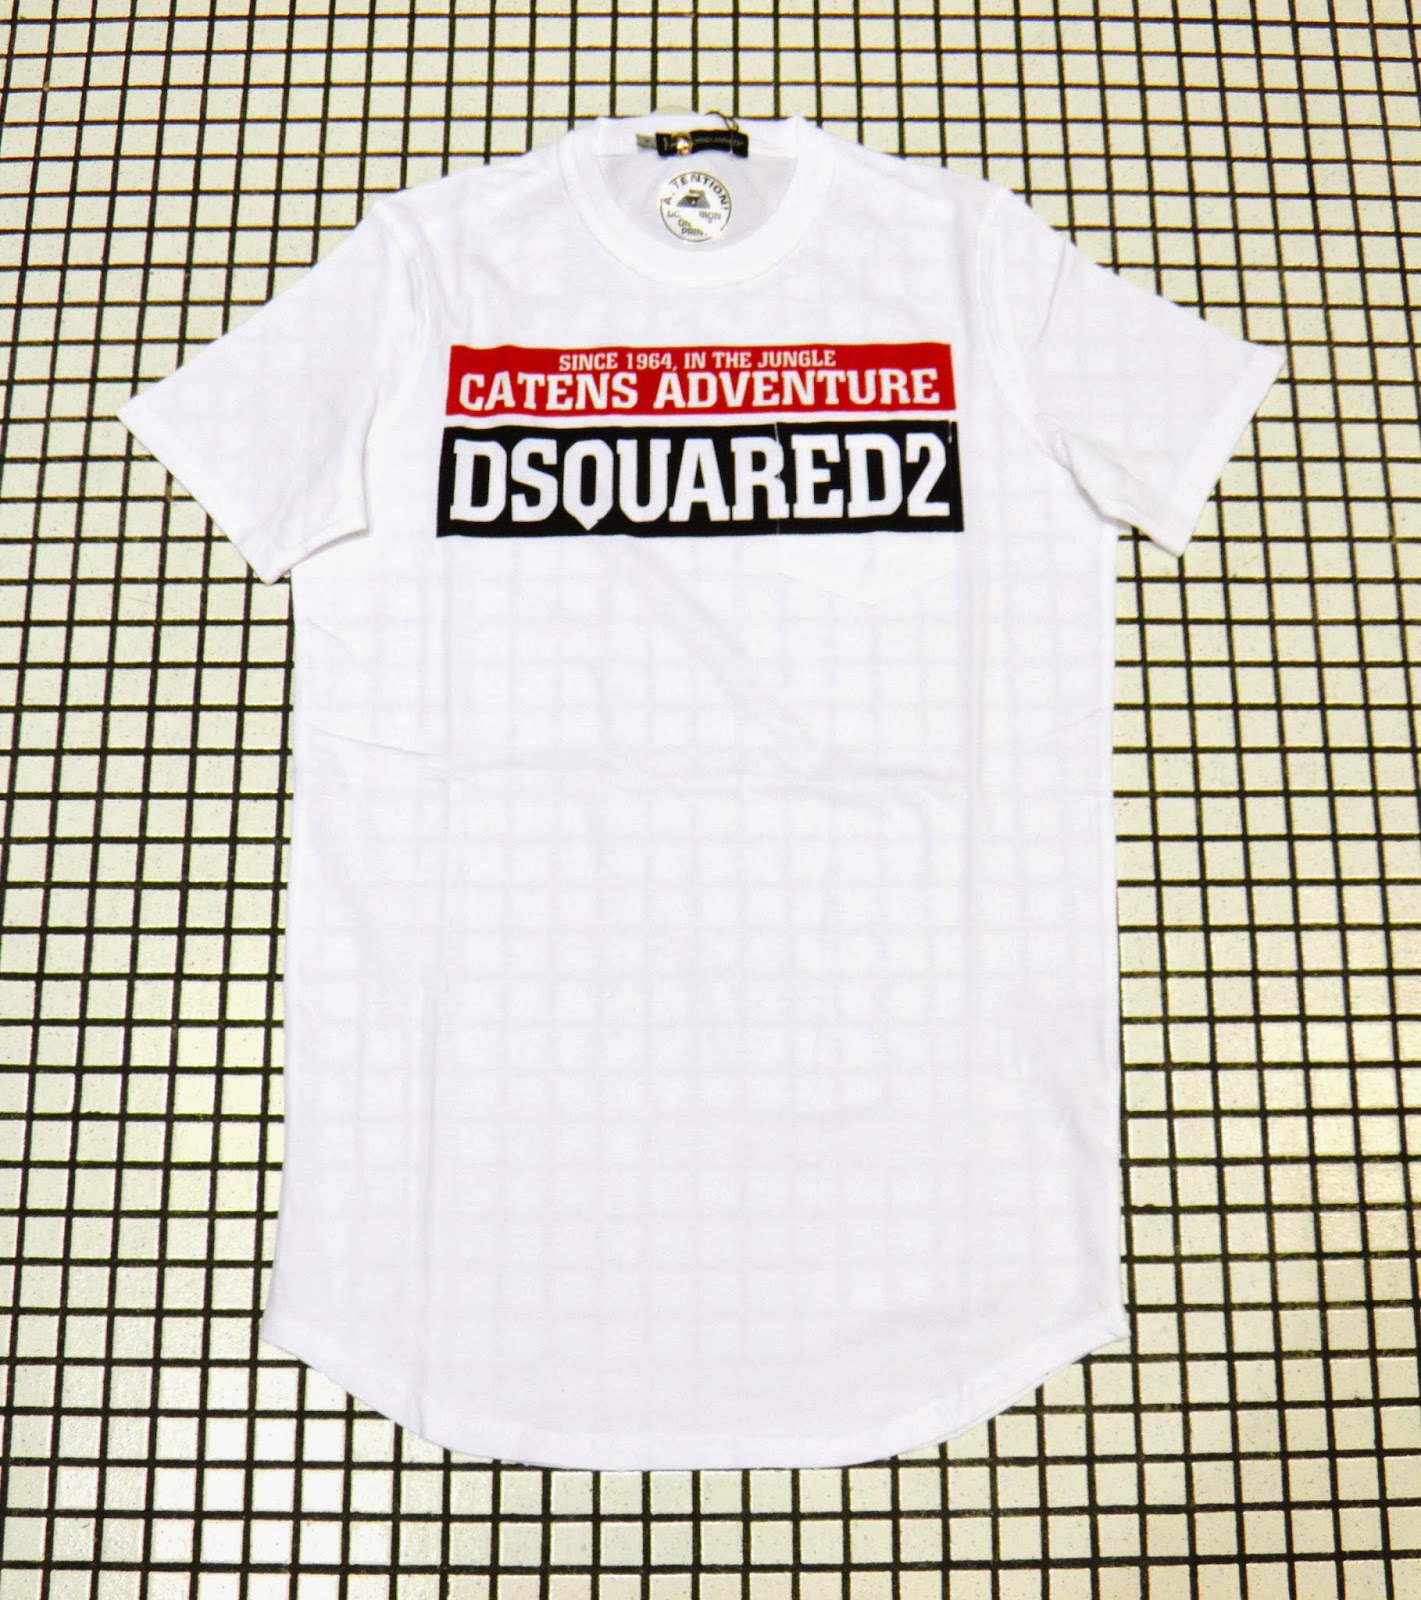 Dsquared Shop Detroit 88 Mitropoleos StrNew Athens POnNZ0w8kX